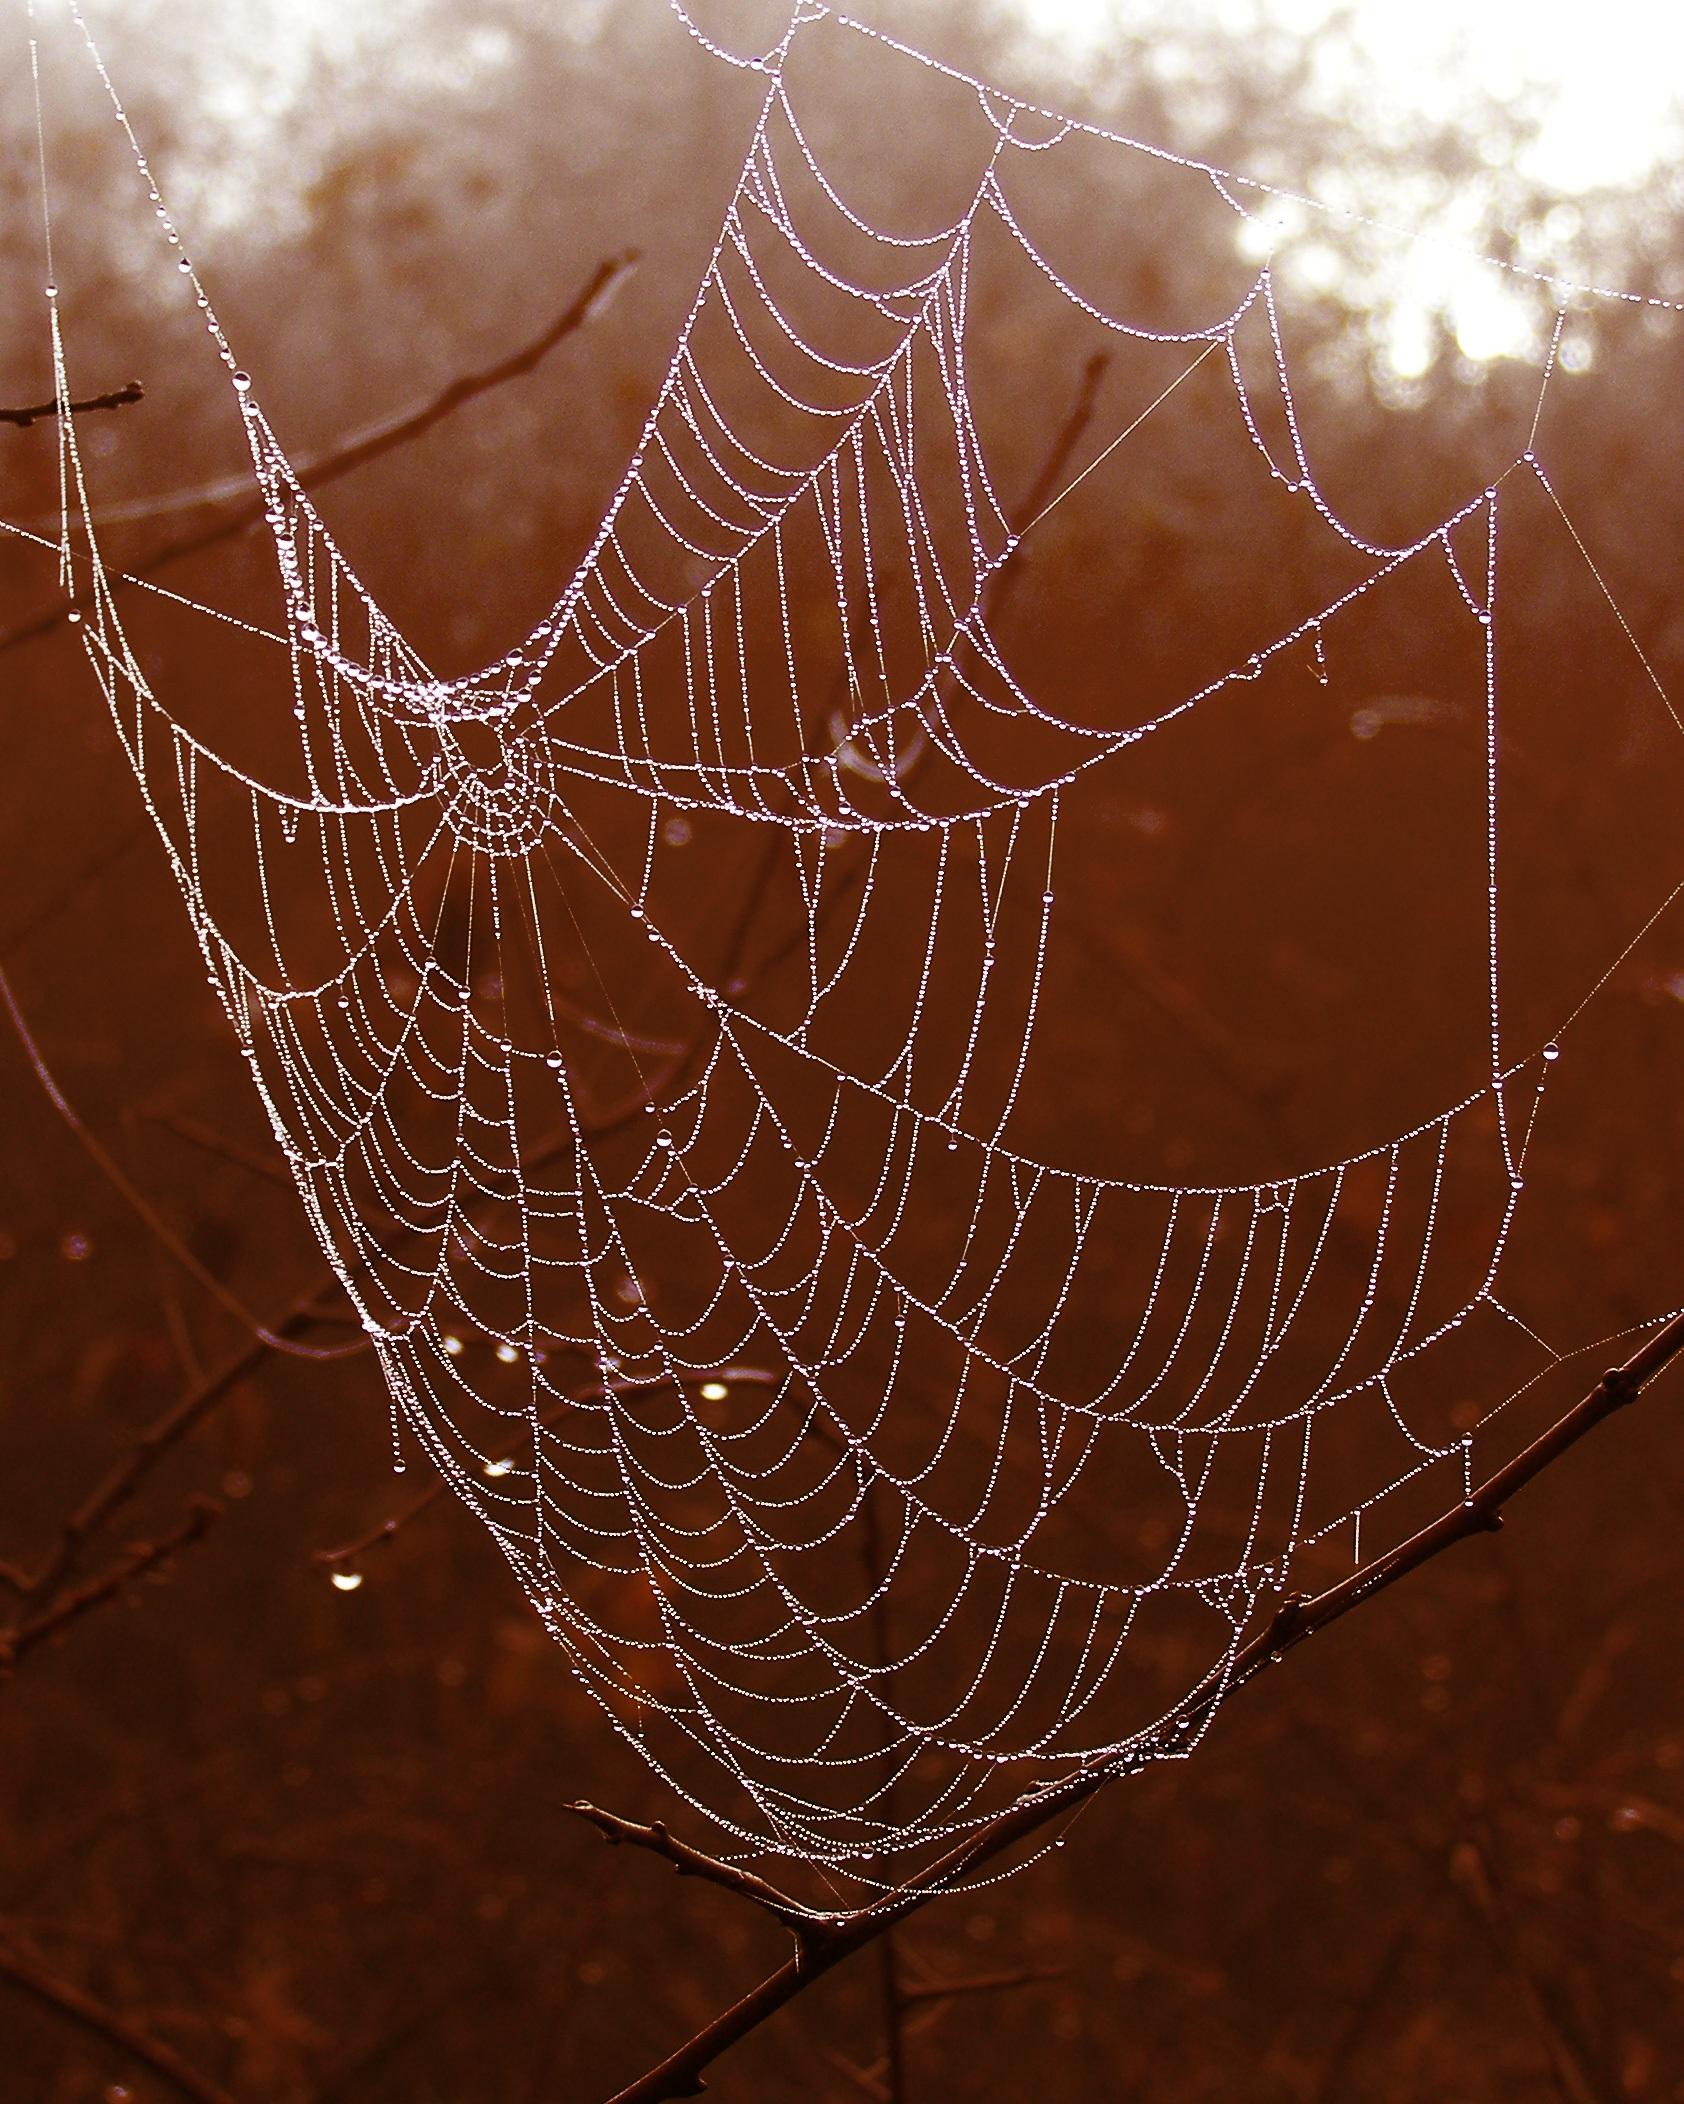 arachnid branches close up cobweb